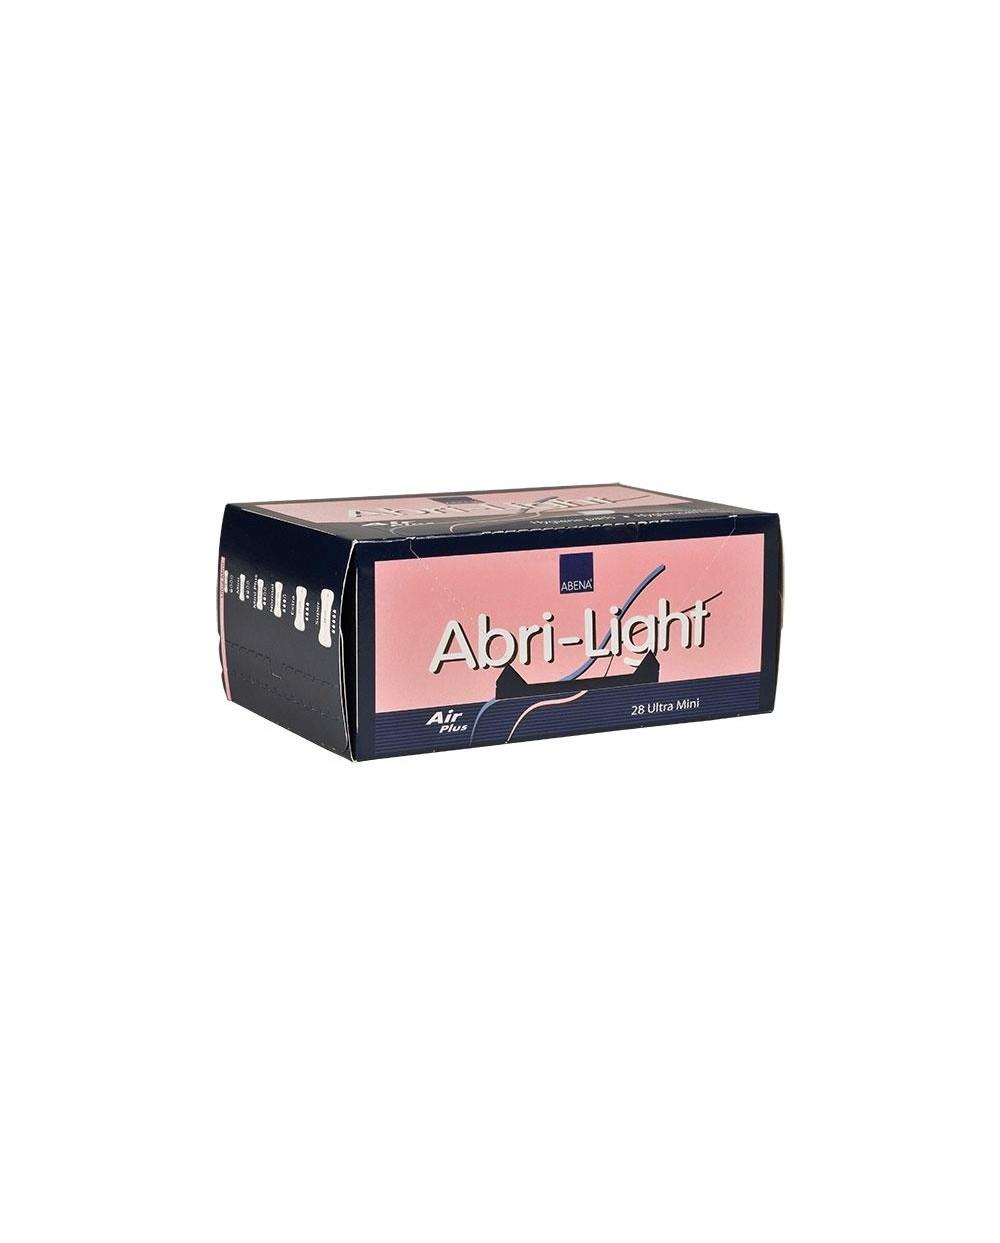 ABENA Abri-San Light Ultra Mini 0 - 24 protections